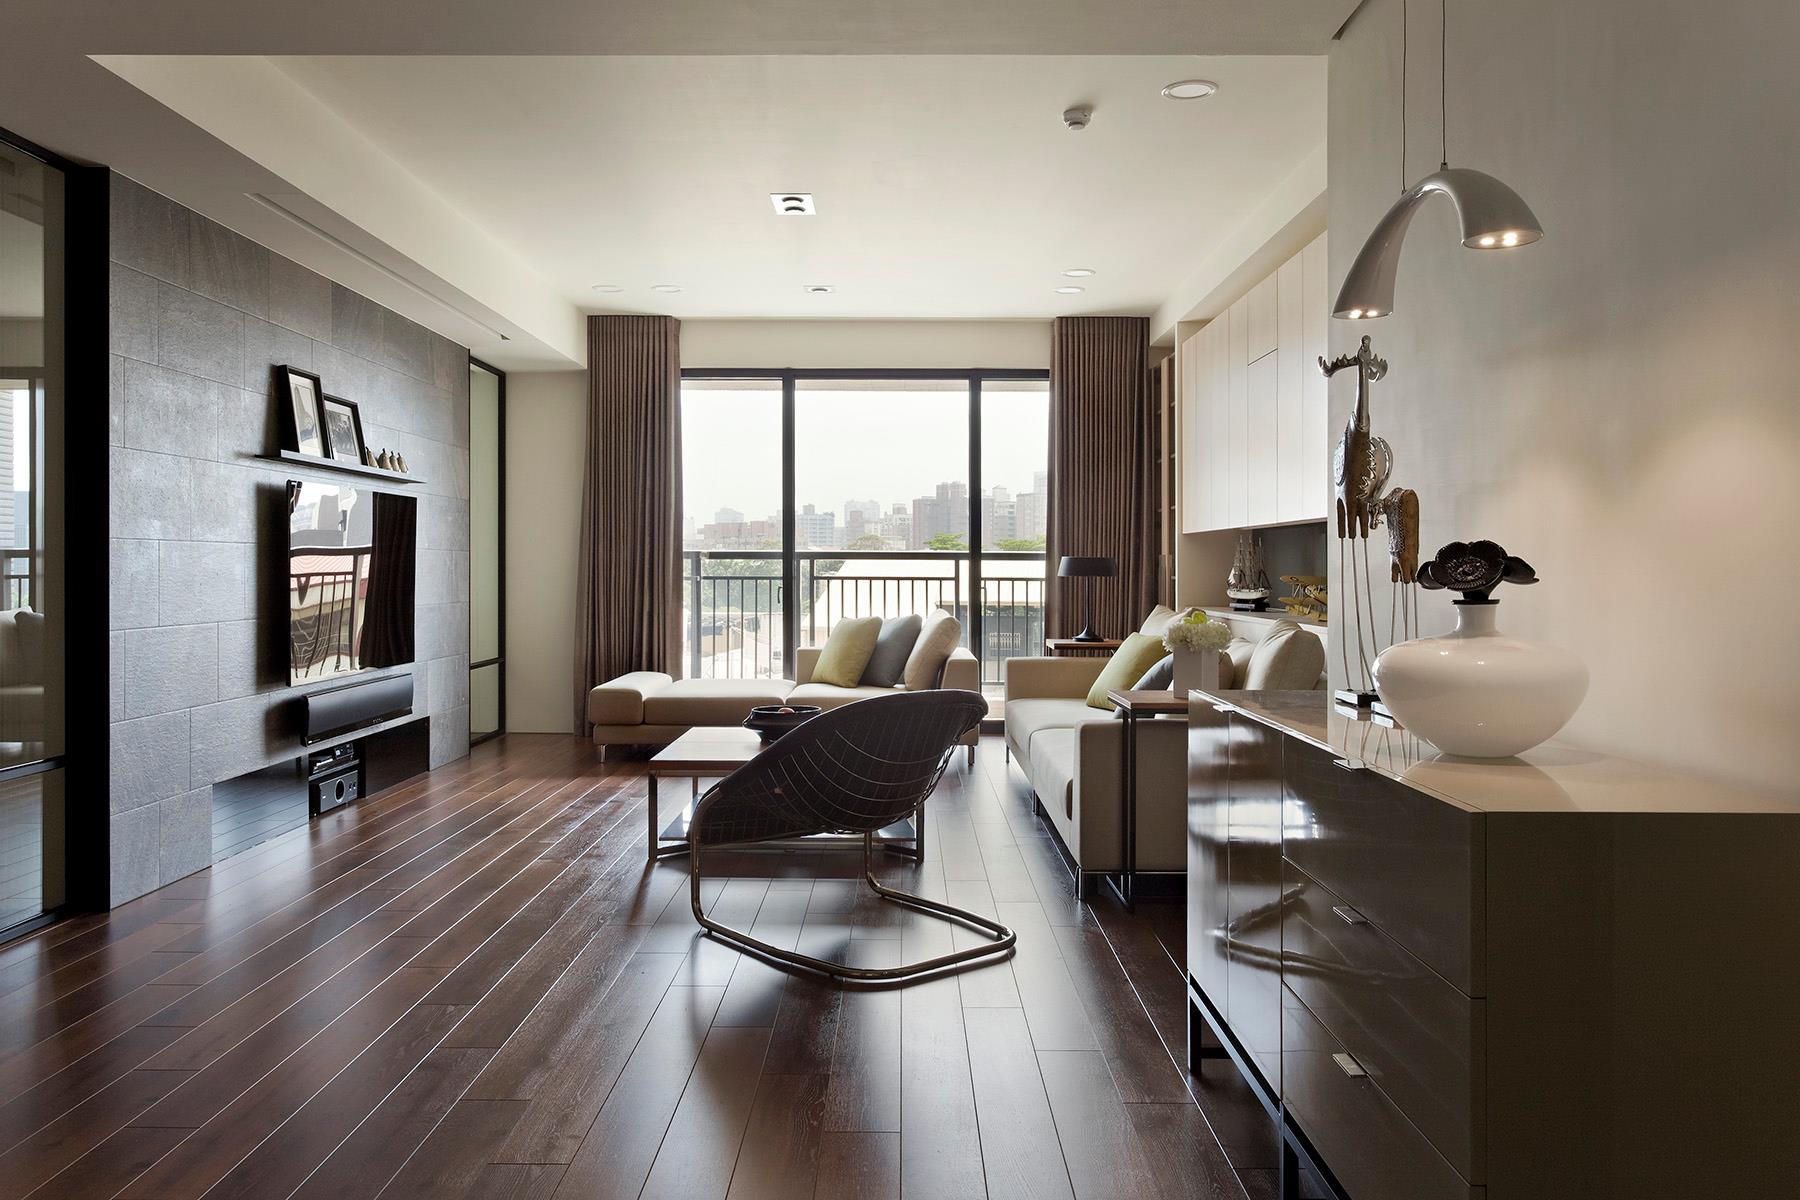 Impressive Living Room Interior Design photo - 7